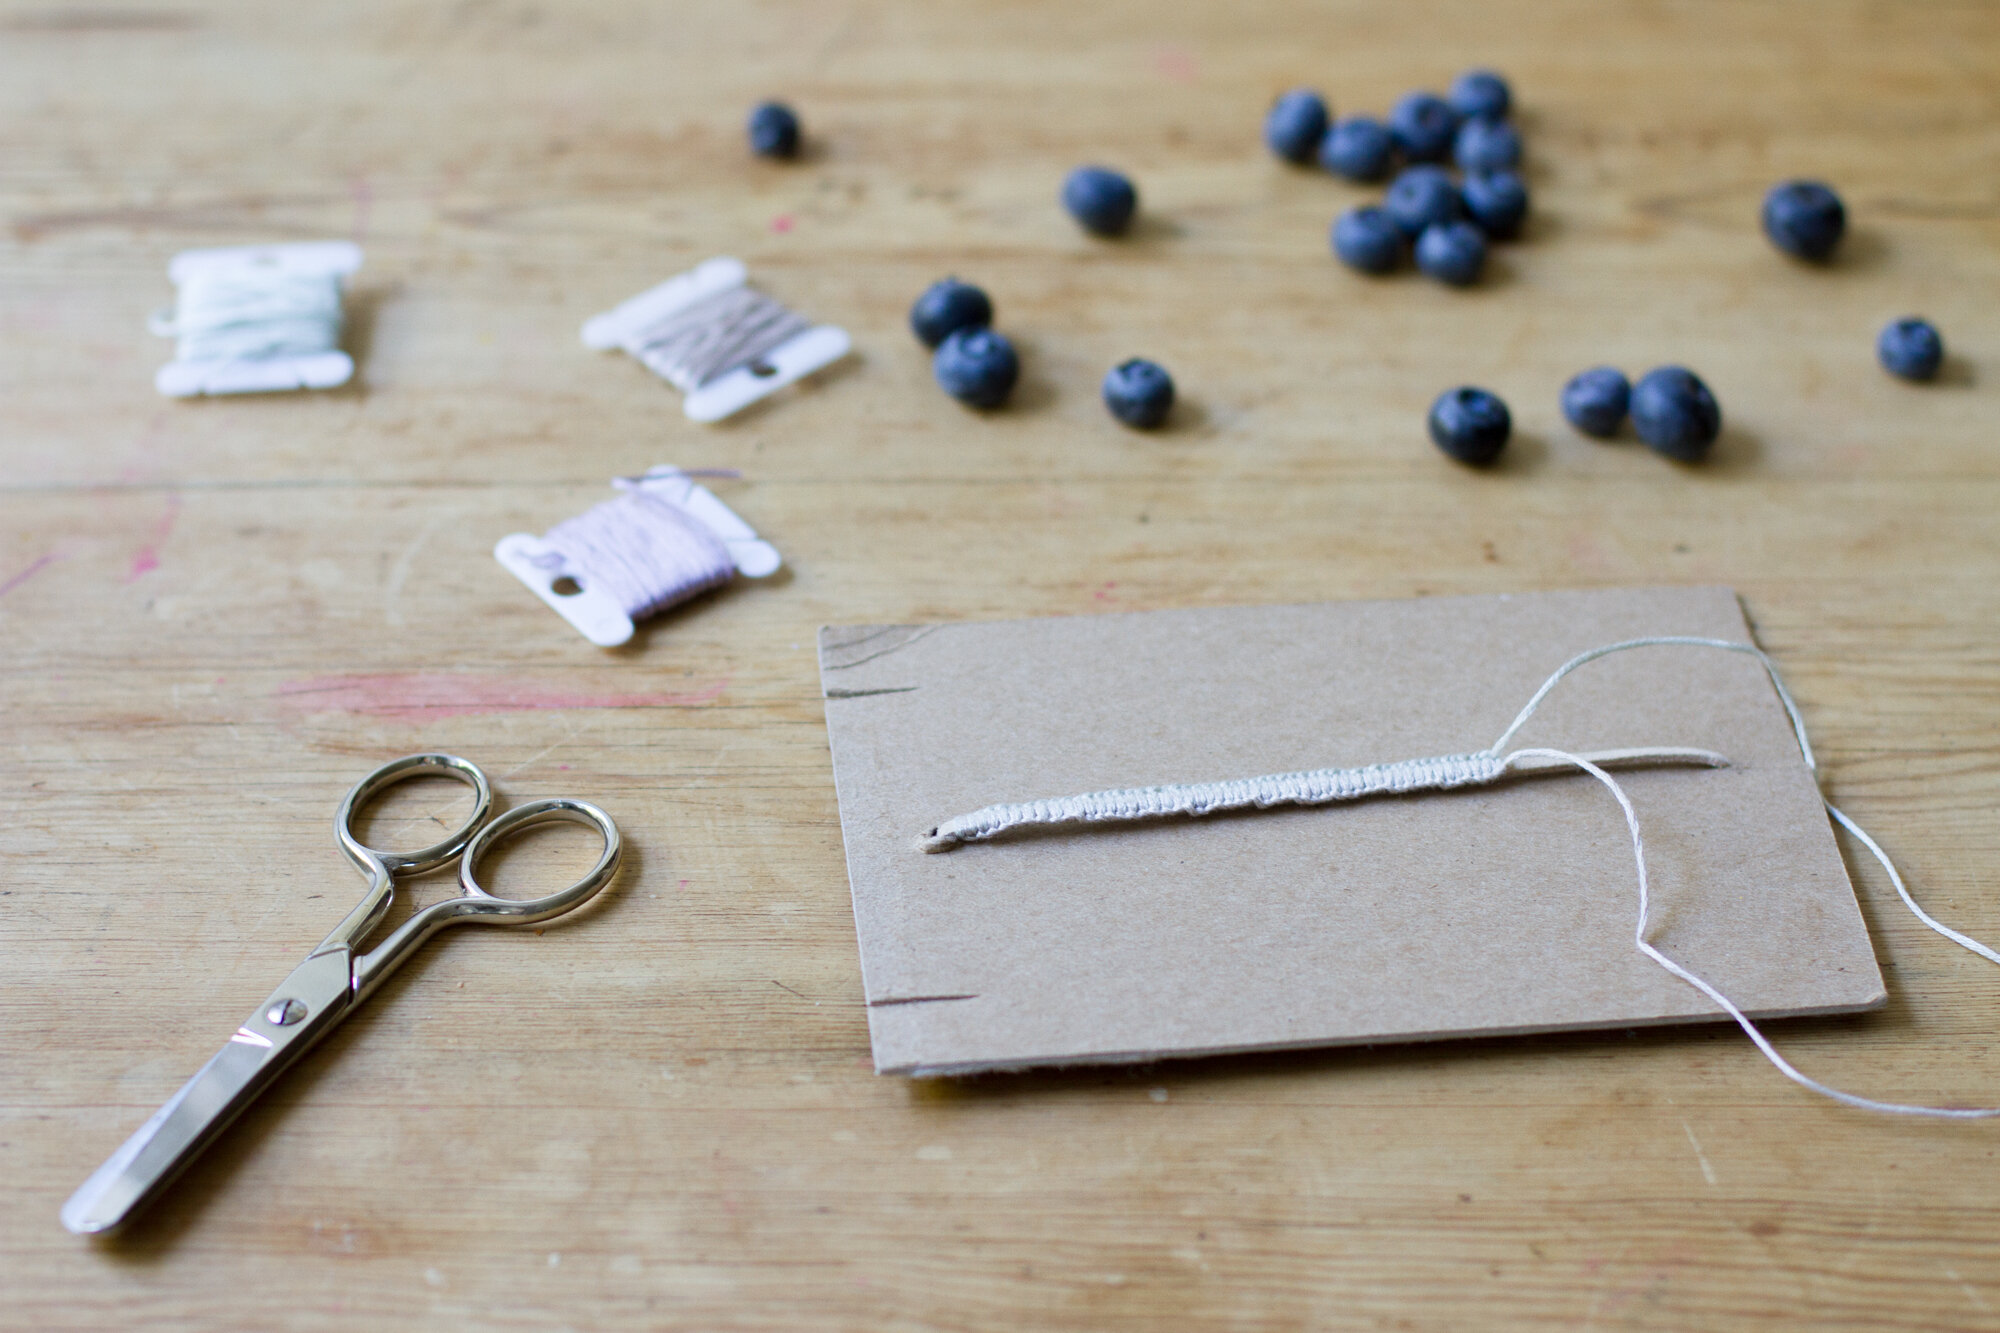 making friendship bracelets, not just for kids | reading my tea leaves